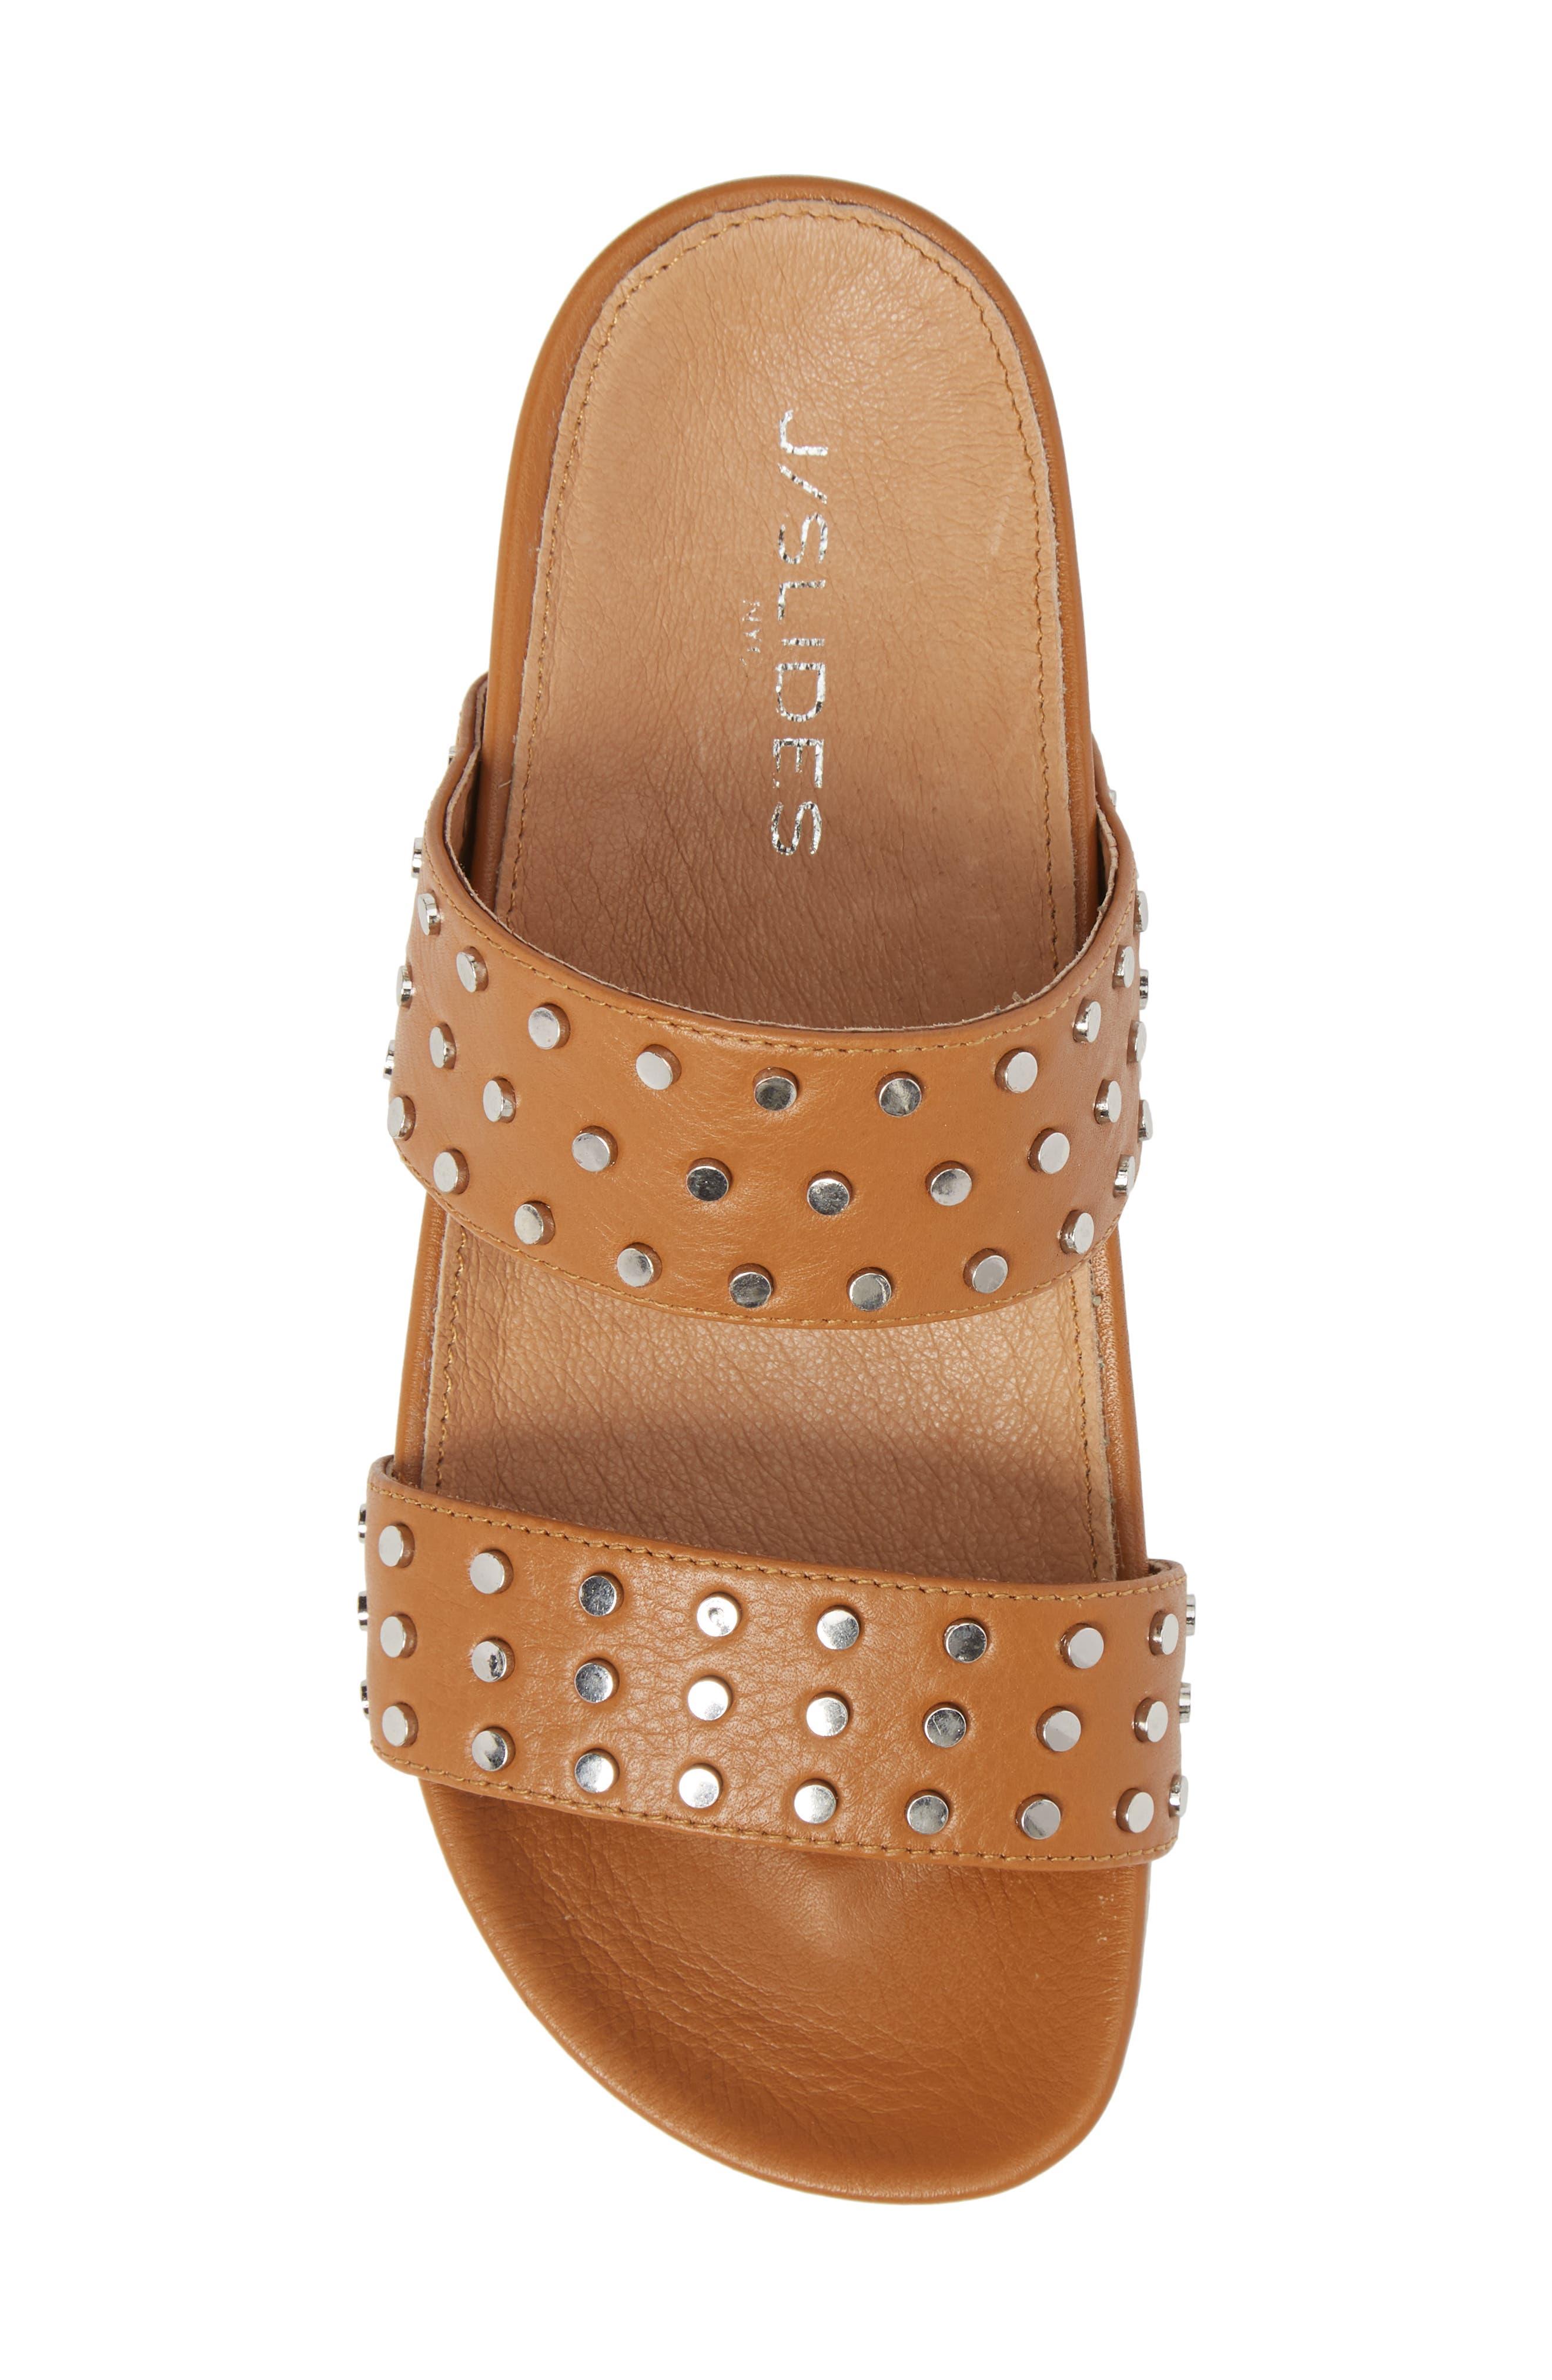 Erika Studded Slide Sandal,                             Alternate thumbnail 5, color,                             Tan Leather